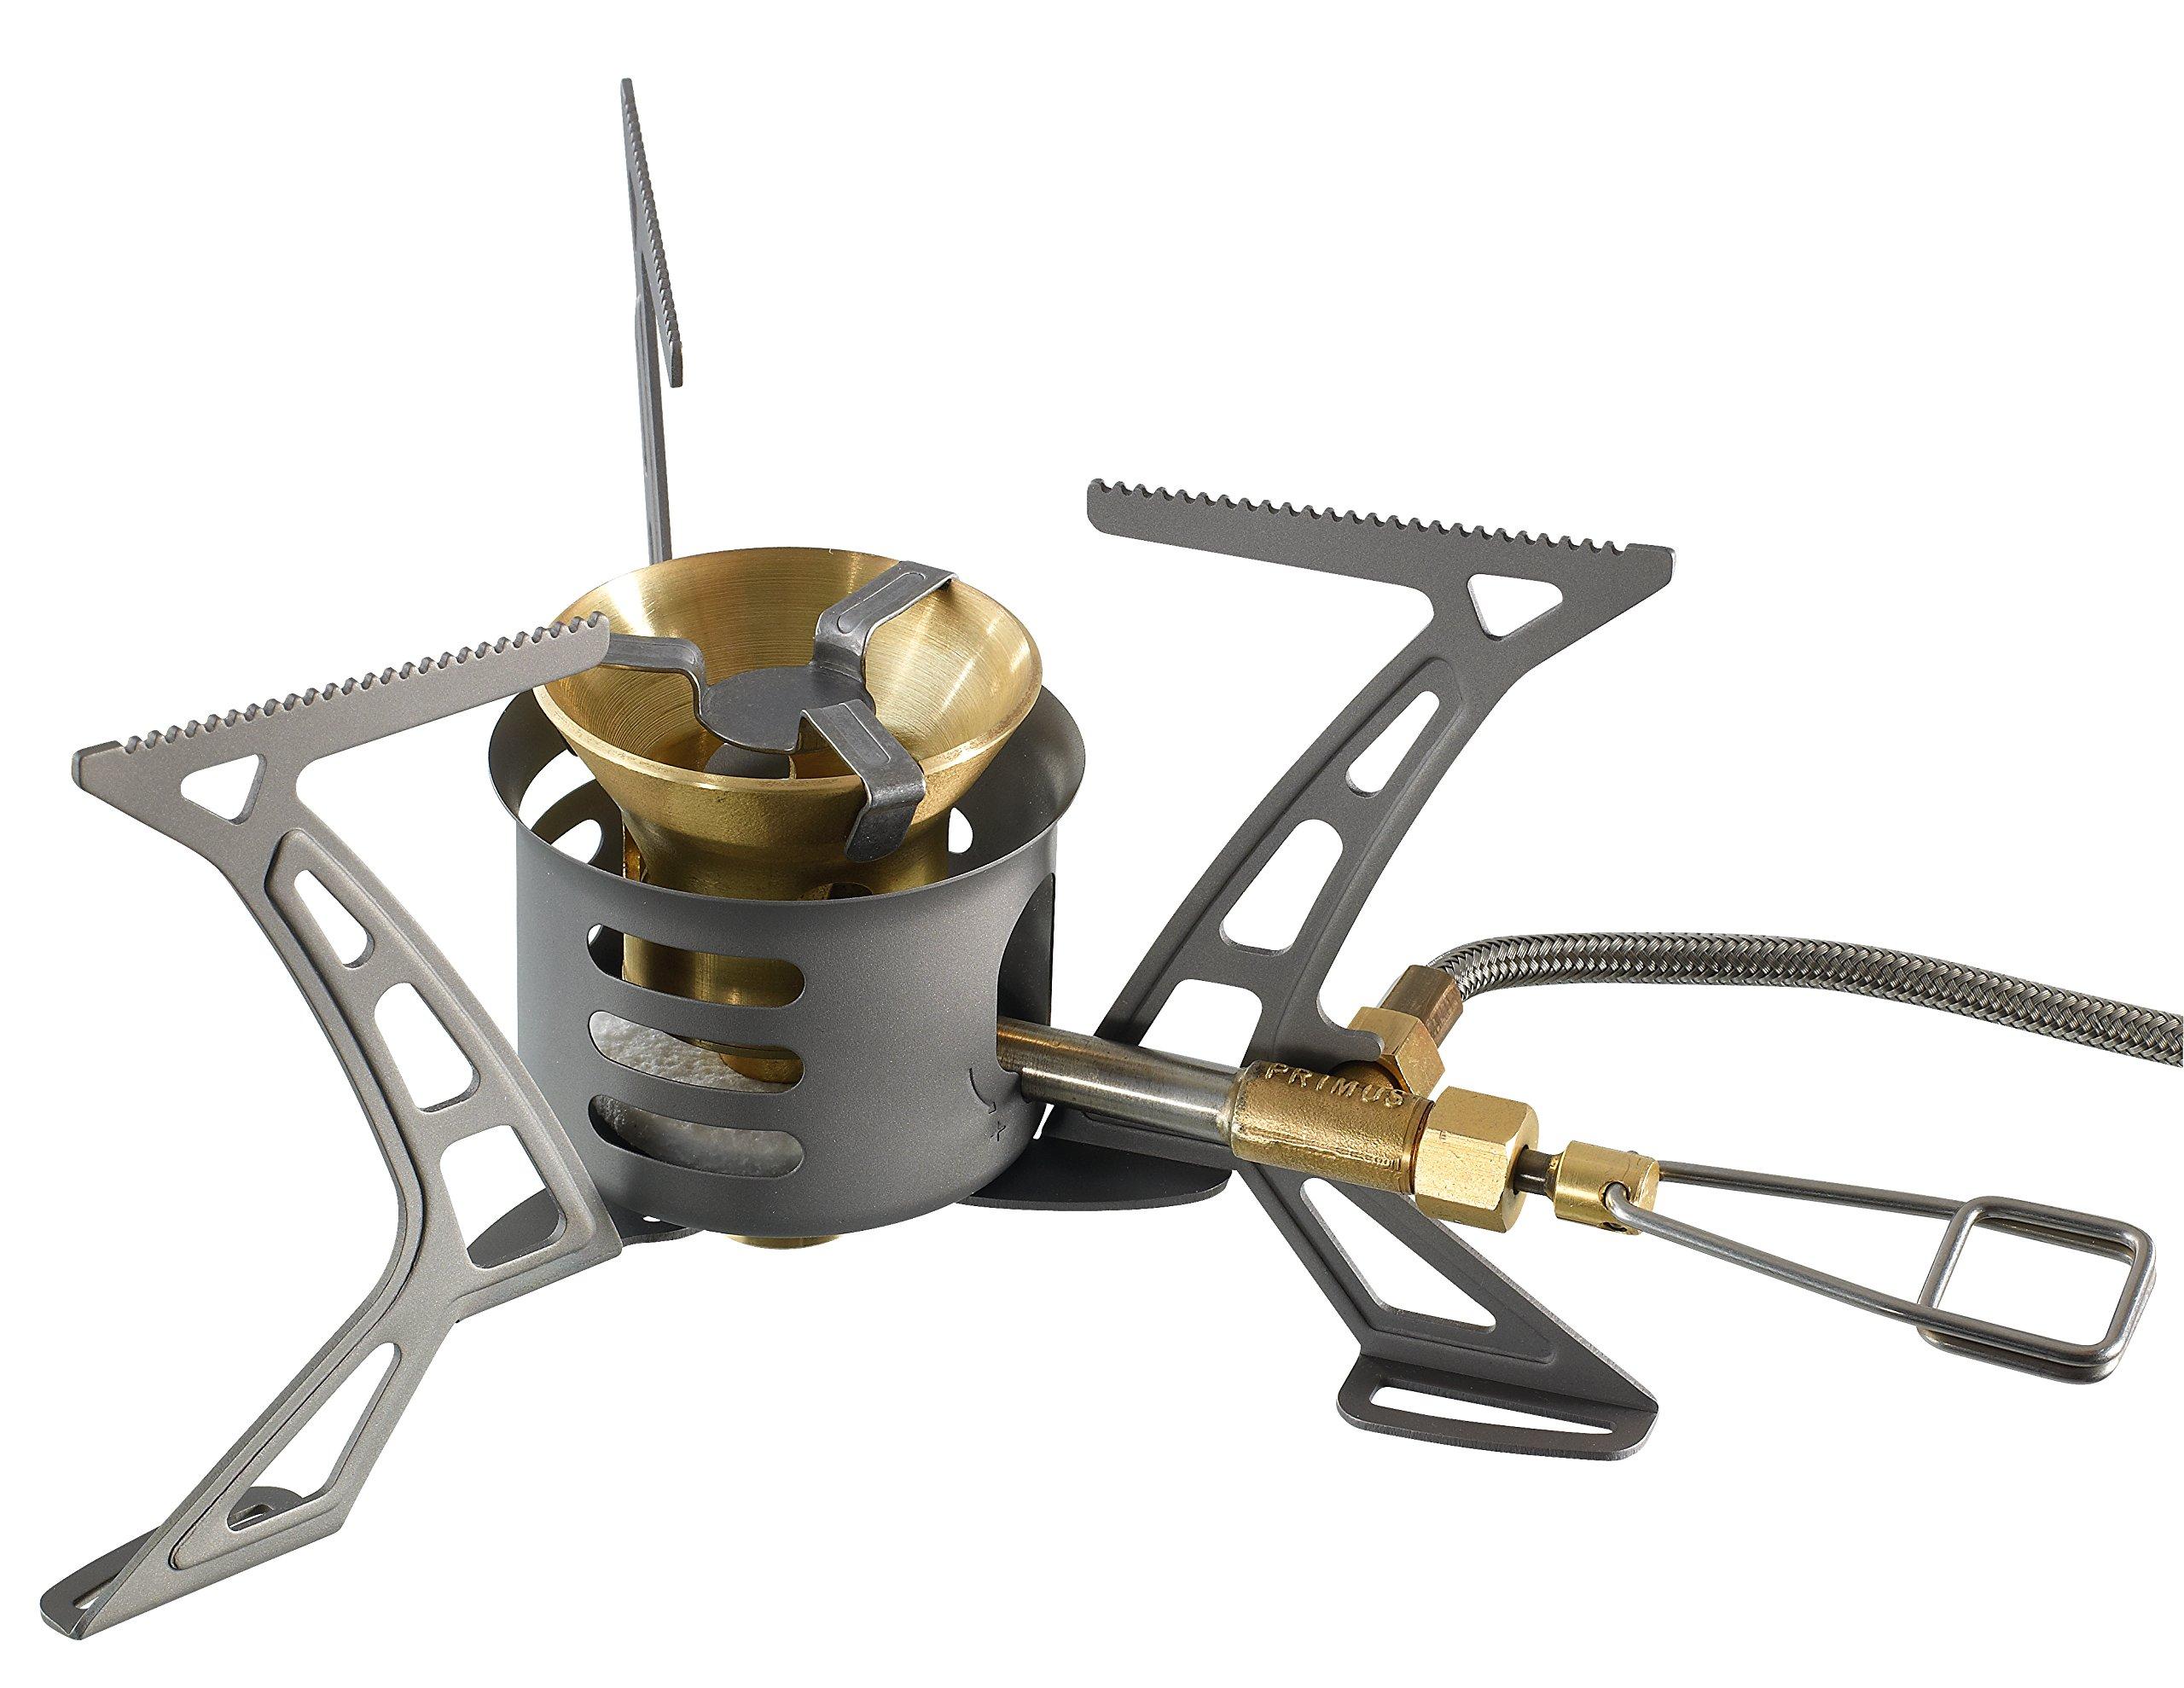 Primus OmniLite TI camping stove grey camping stove by Primus (Image #7)